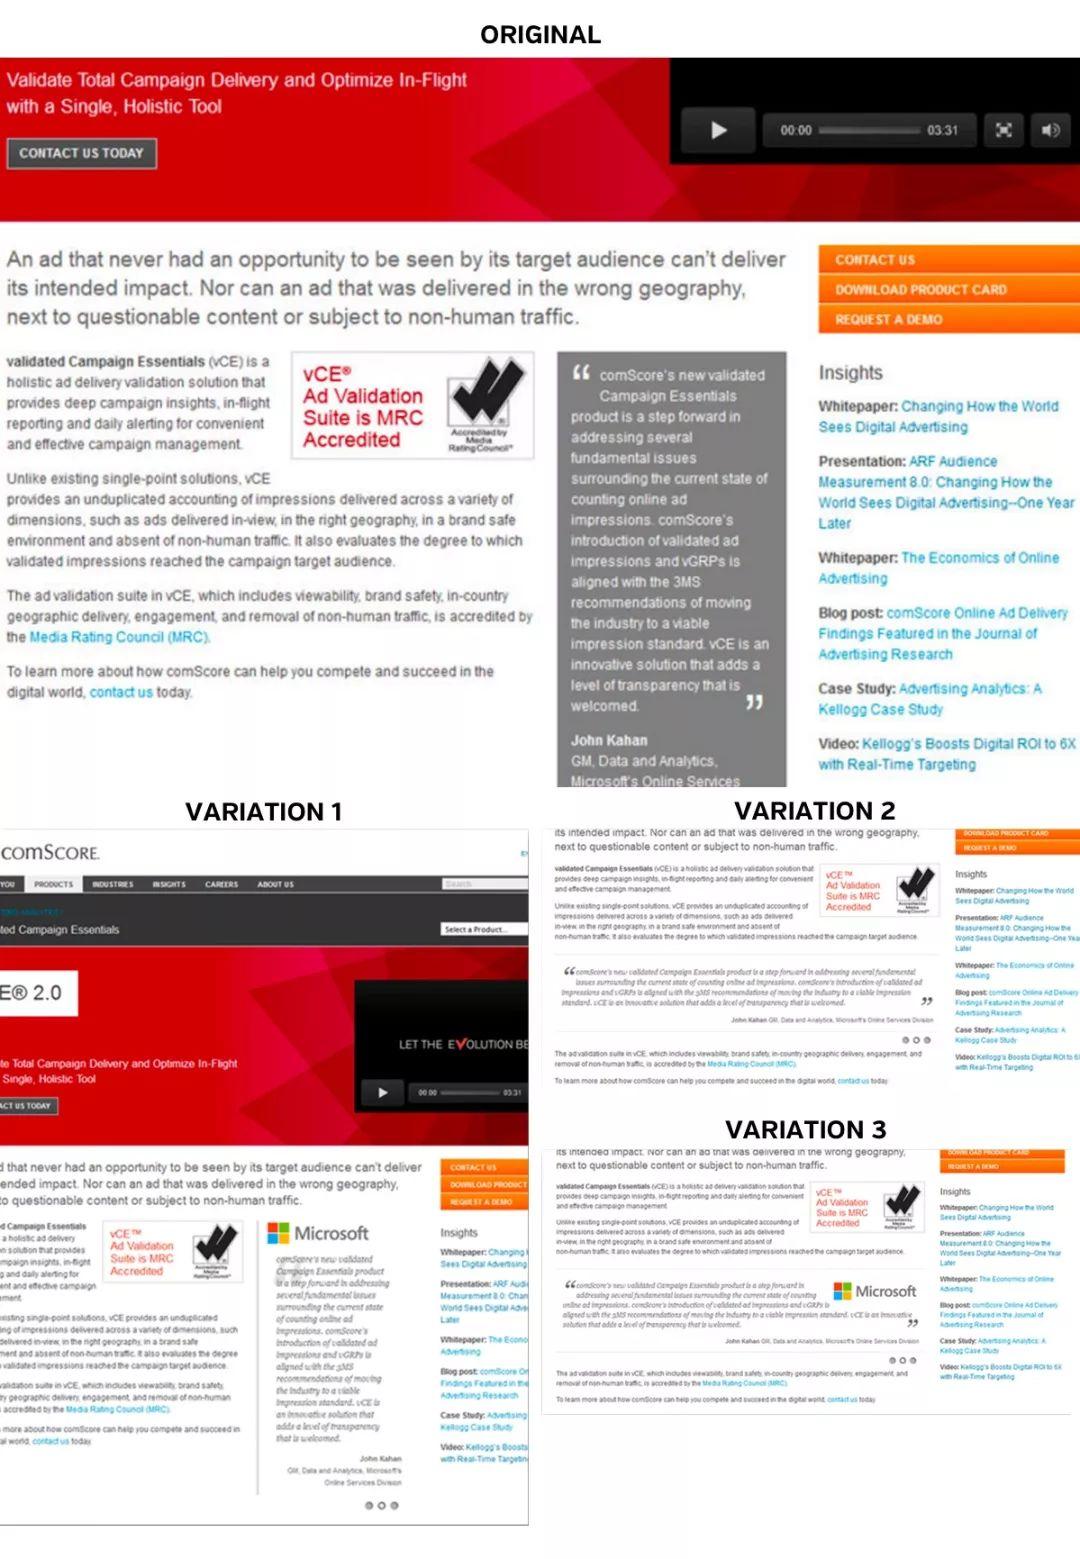 ab测试网页